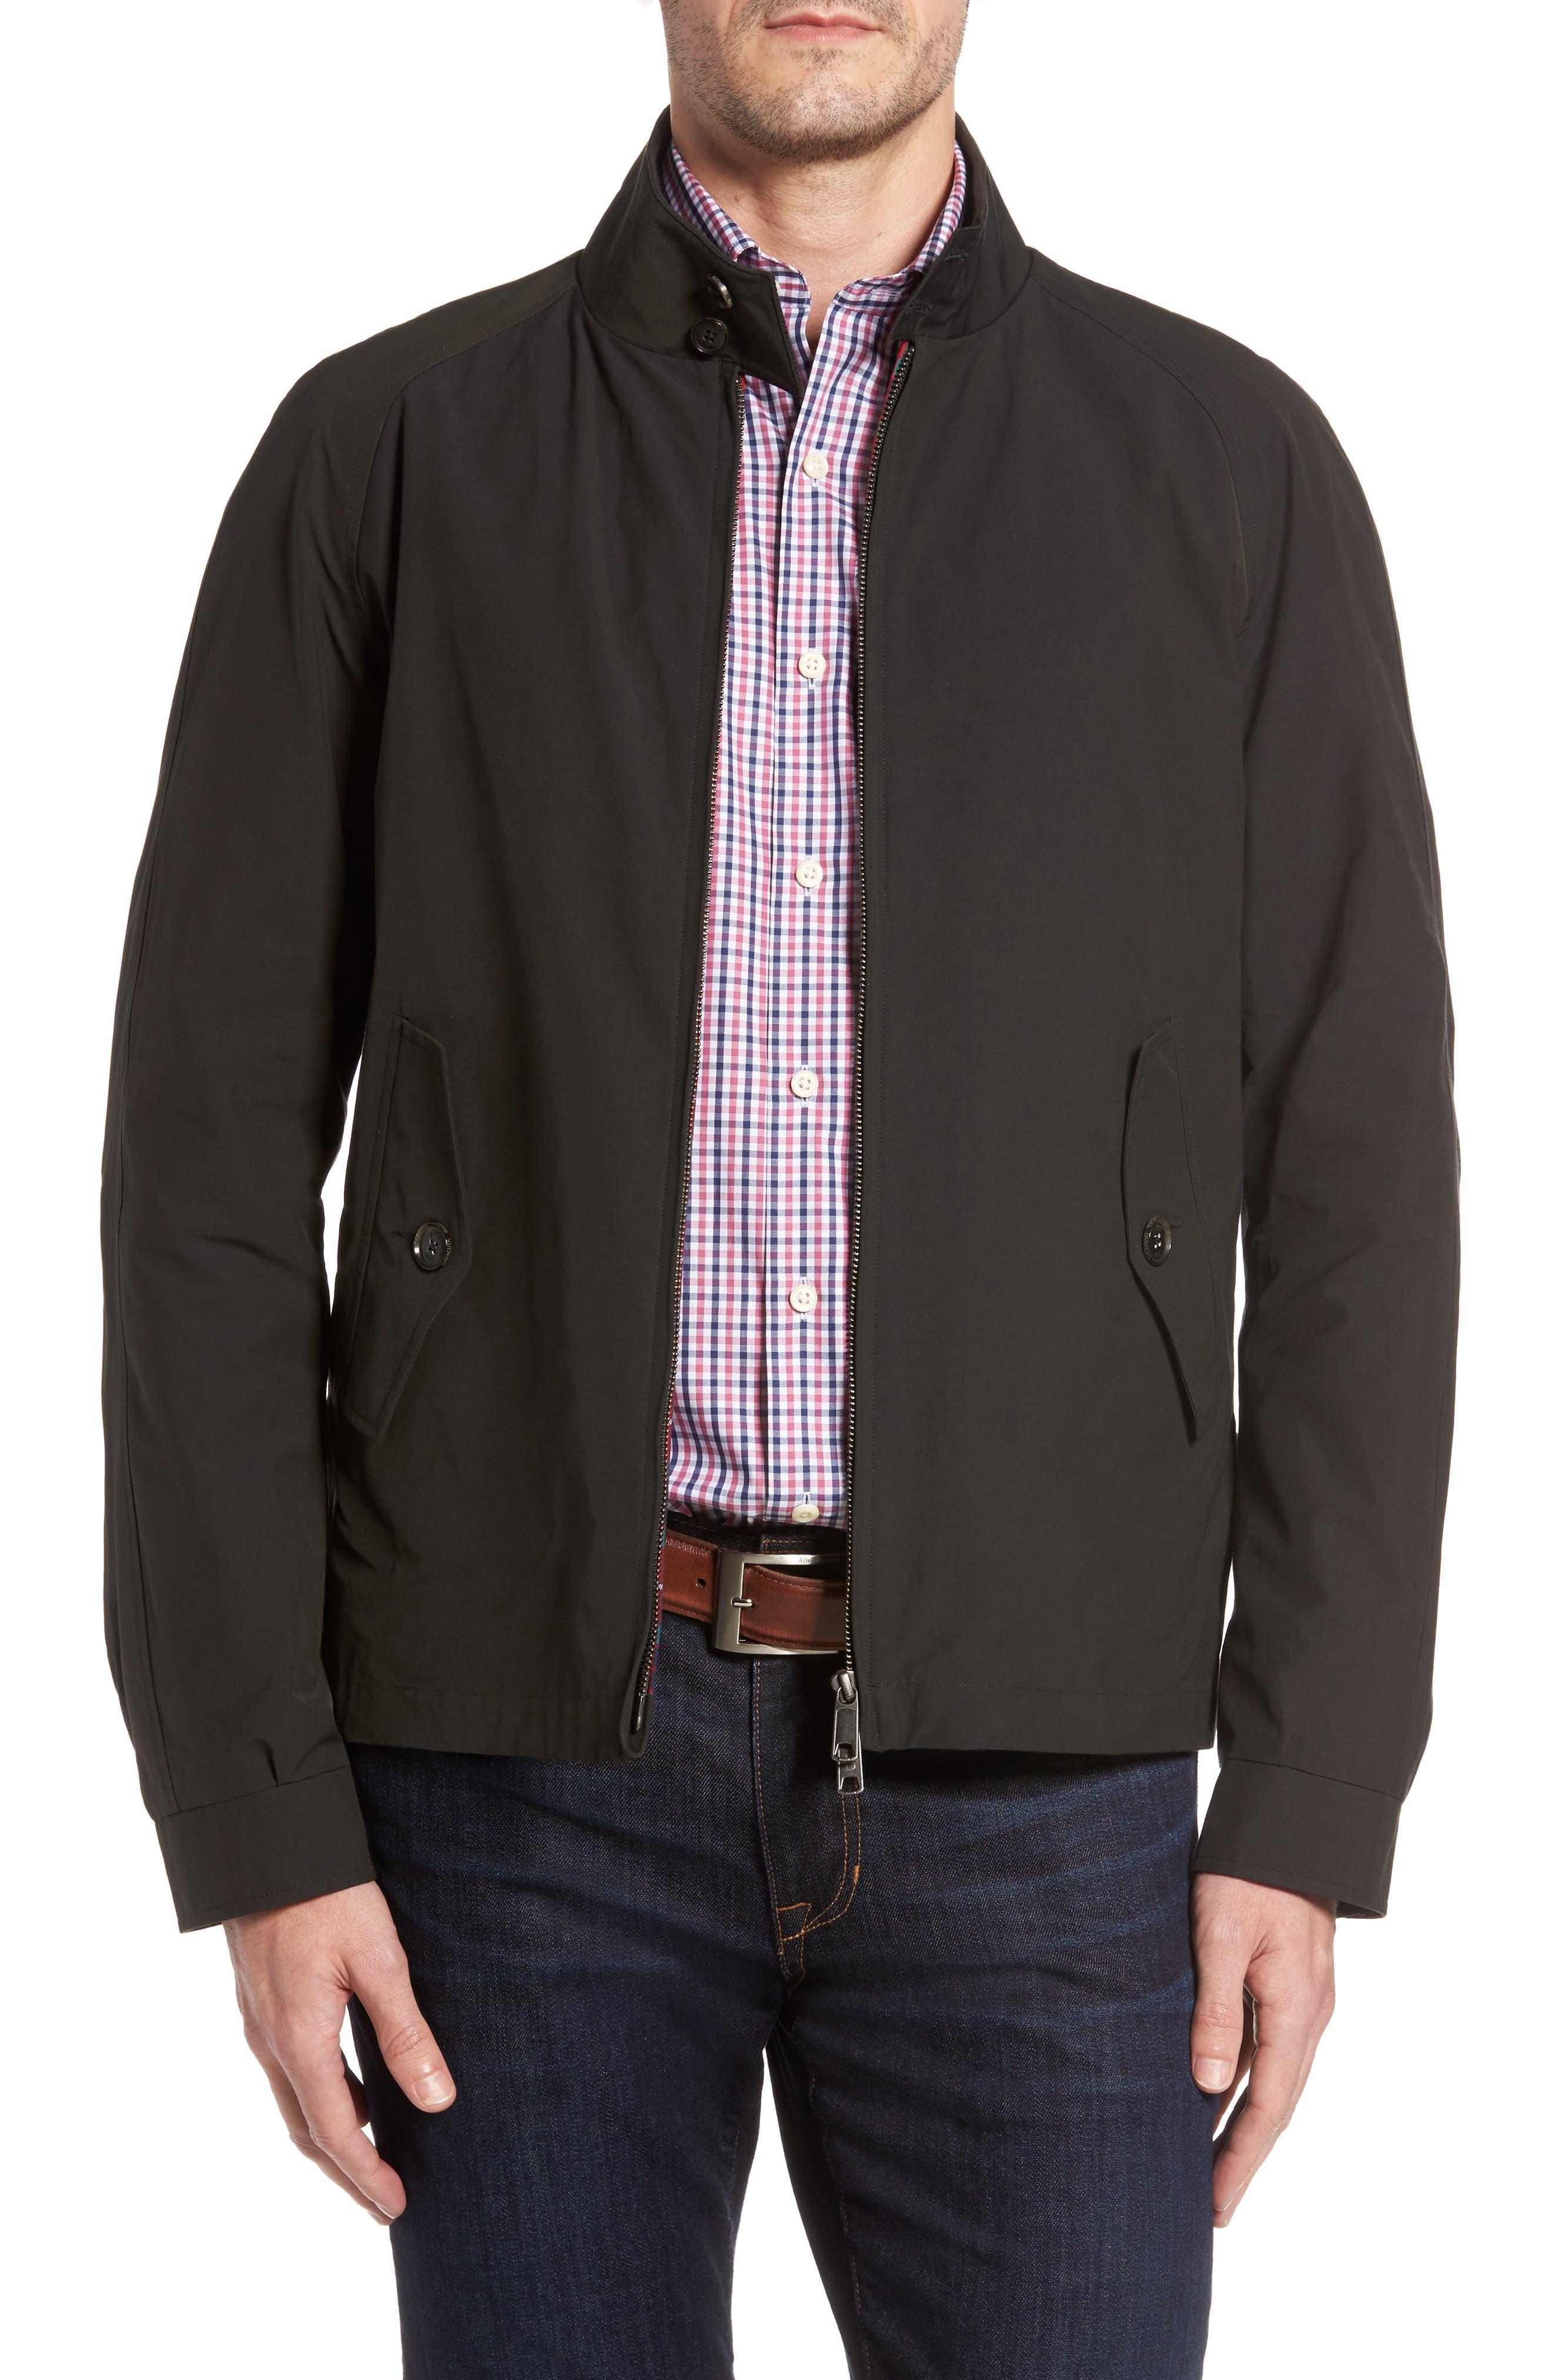 Alternate Image 1 Selected - Baracuta G4 Water Repellent Harrington Jacket